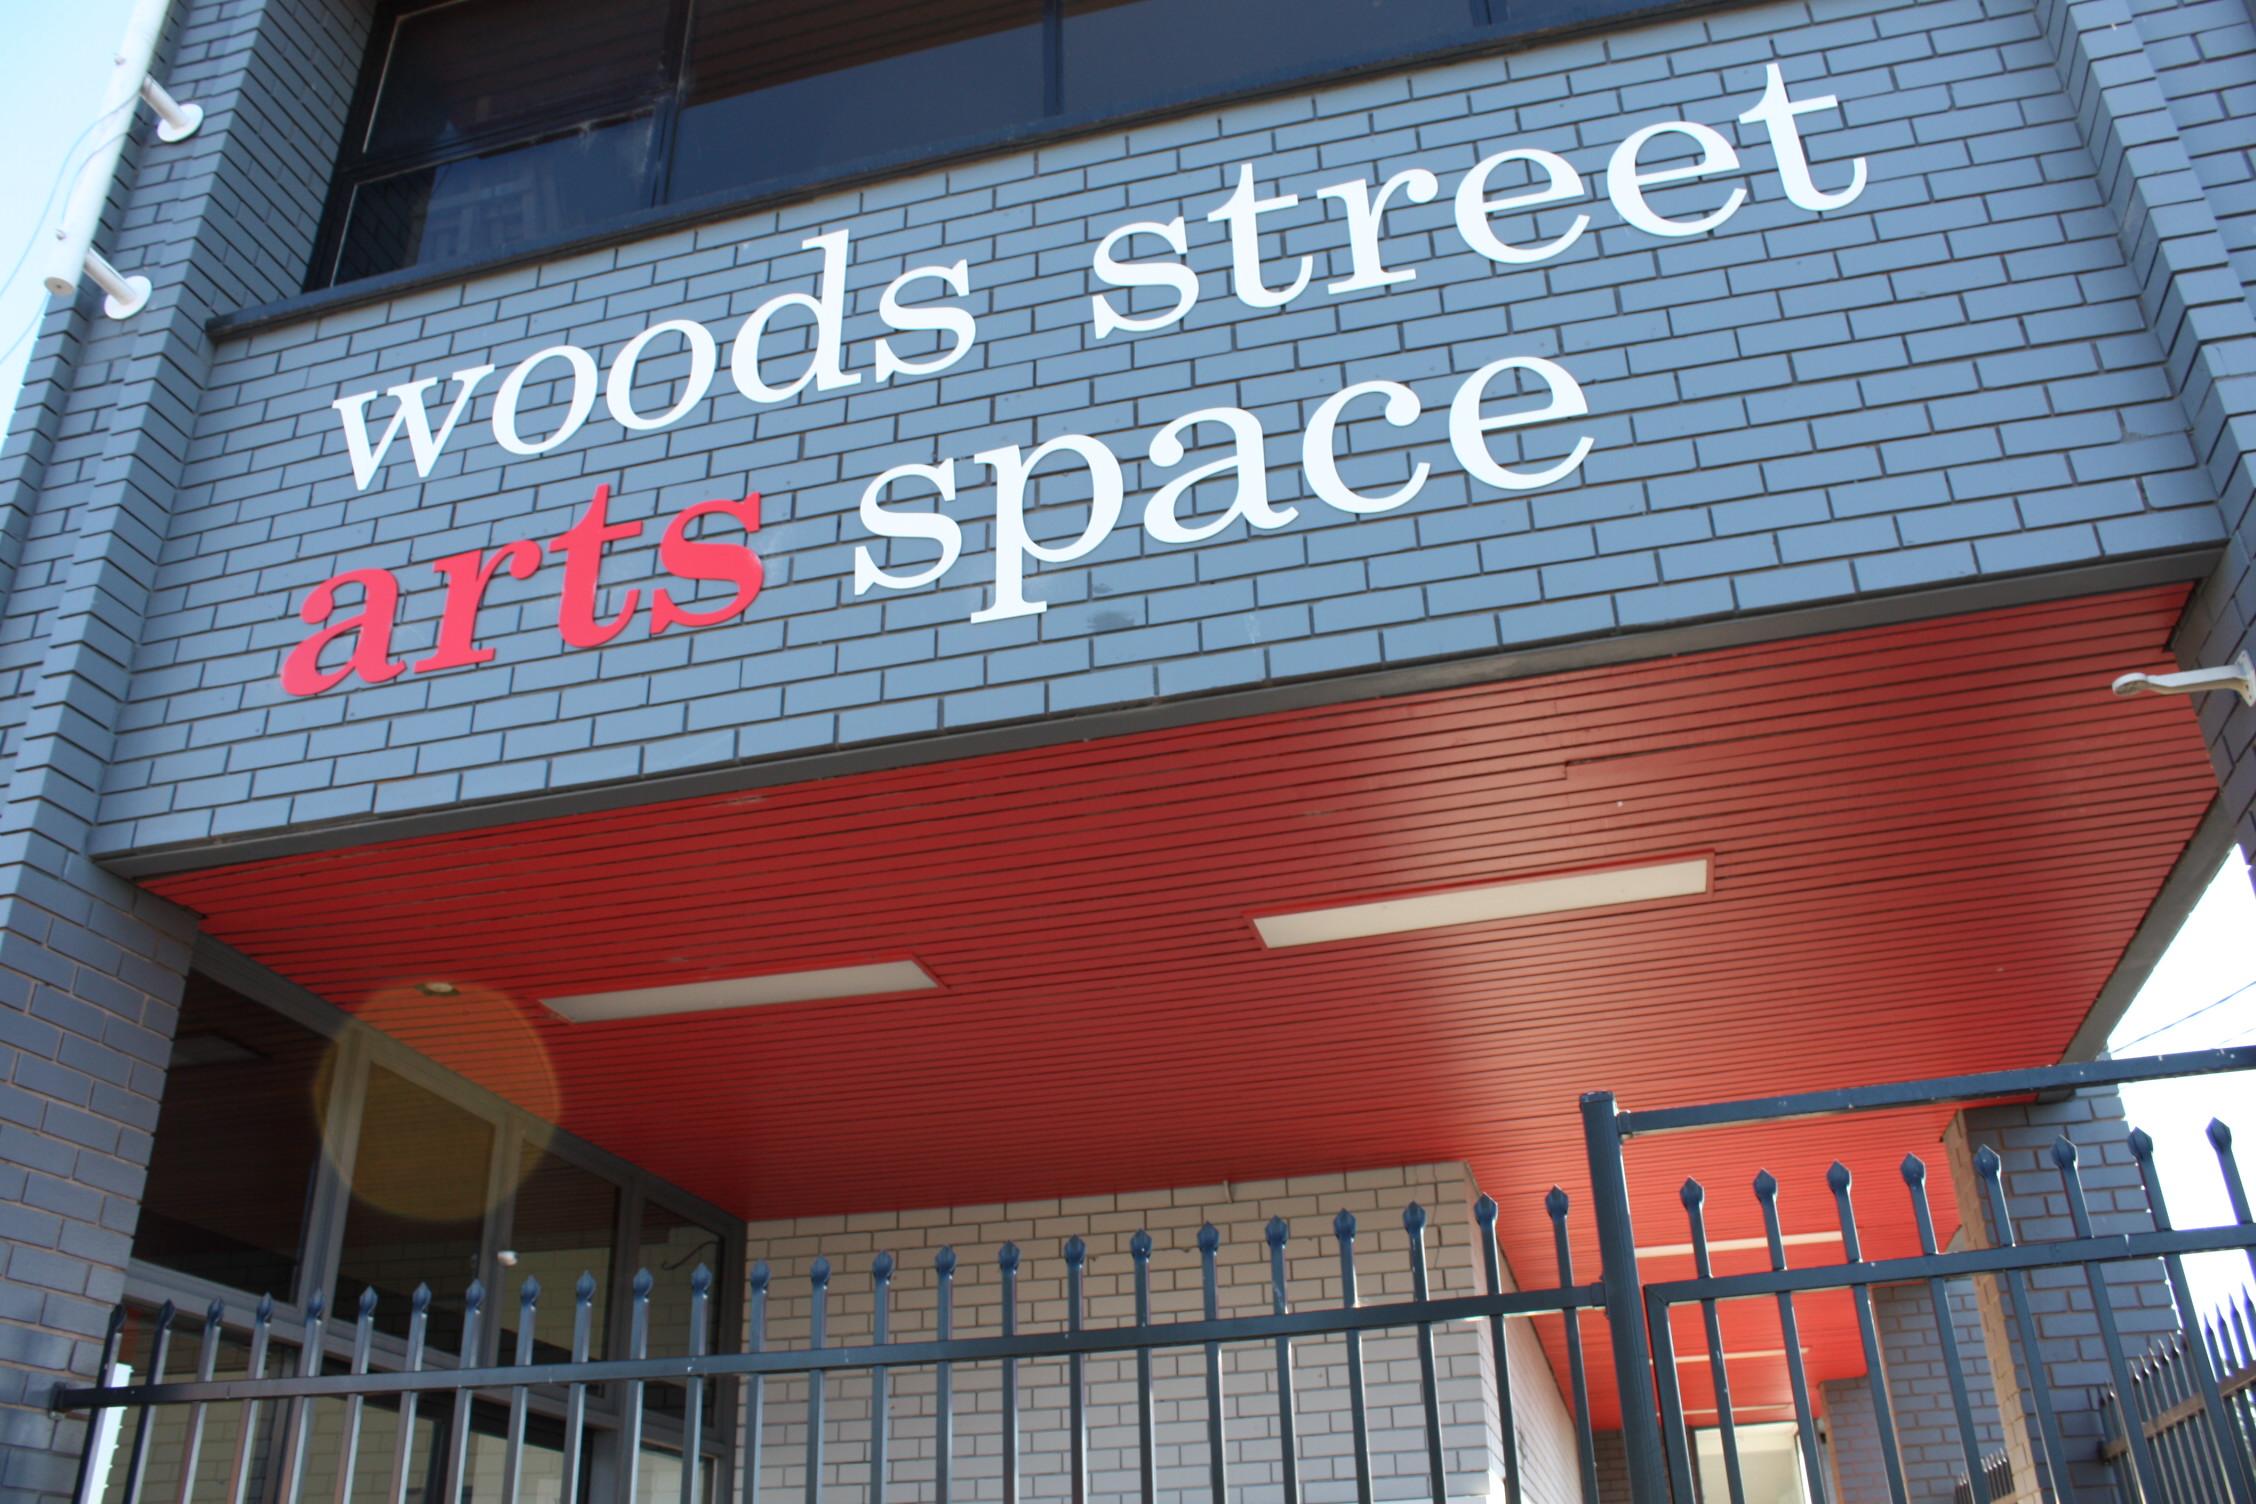 woods st arts space, laverton - Mamma Knows West